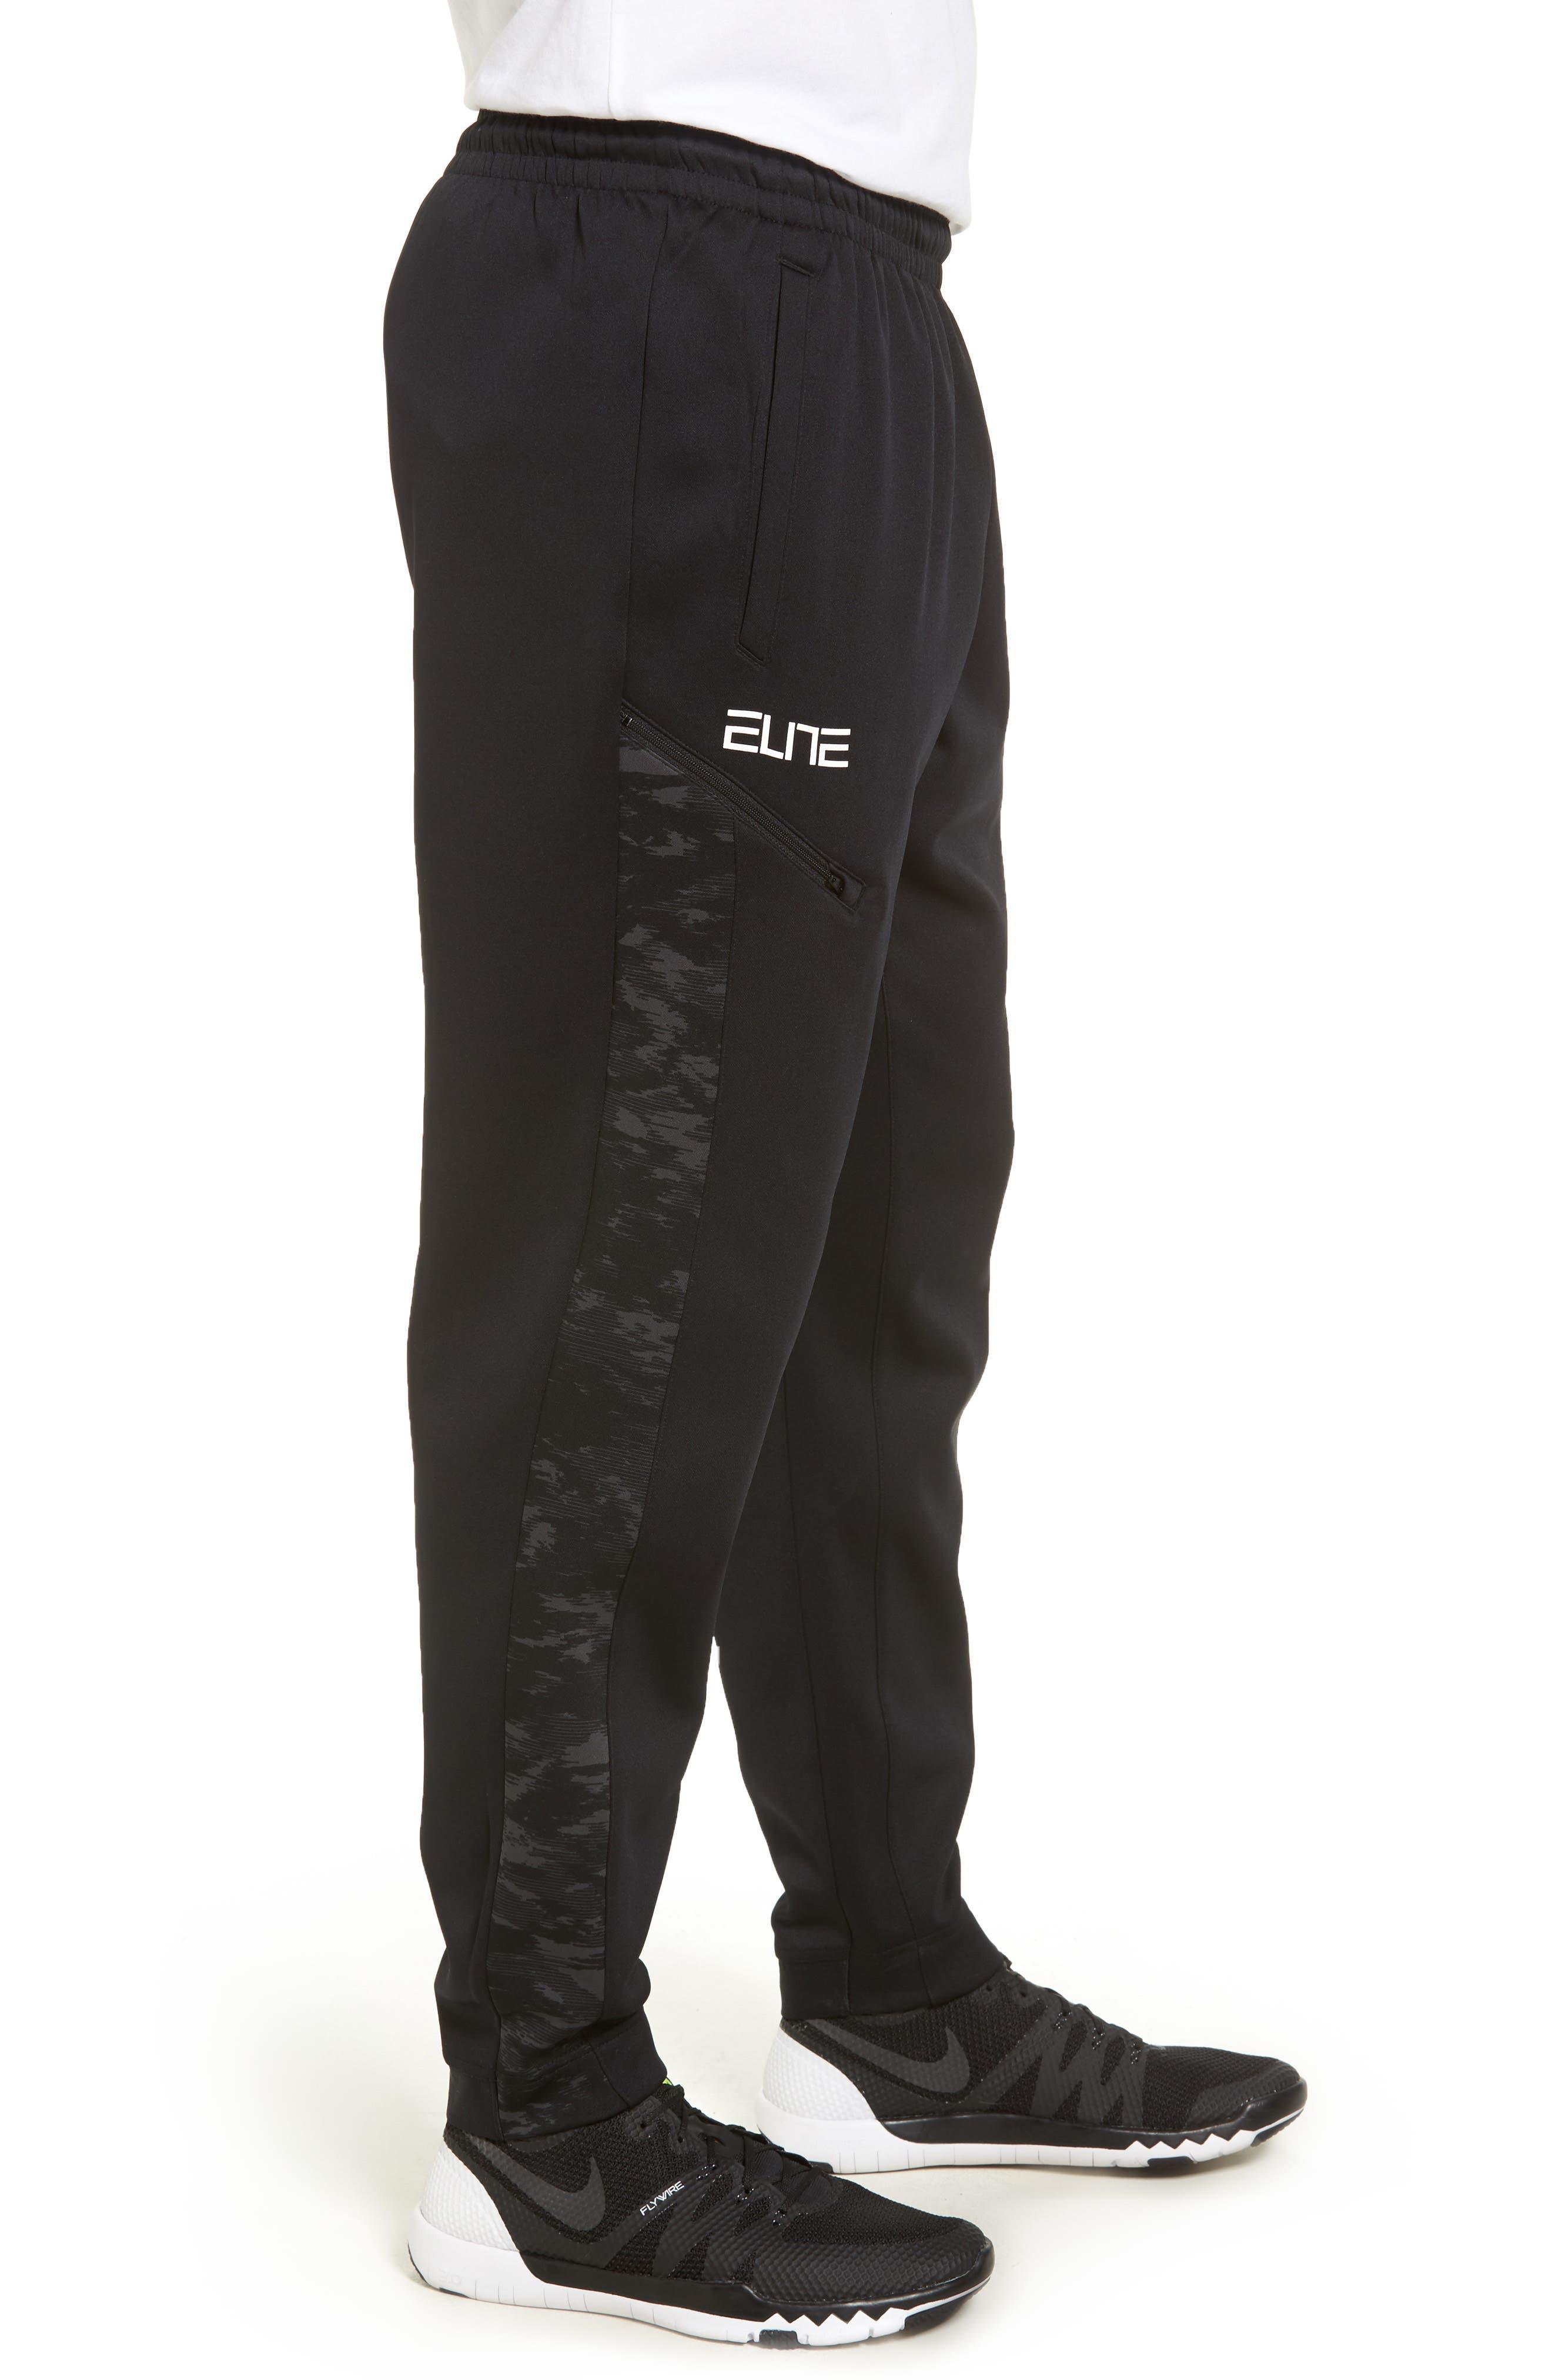 Therma Elite Basketball Pants,                             Alternate thumbnail 3, color,                             010